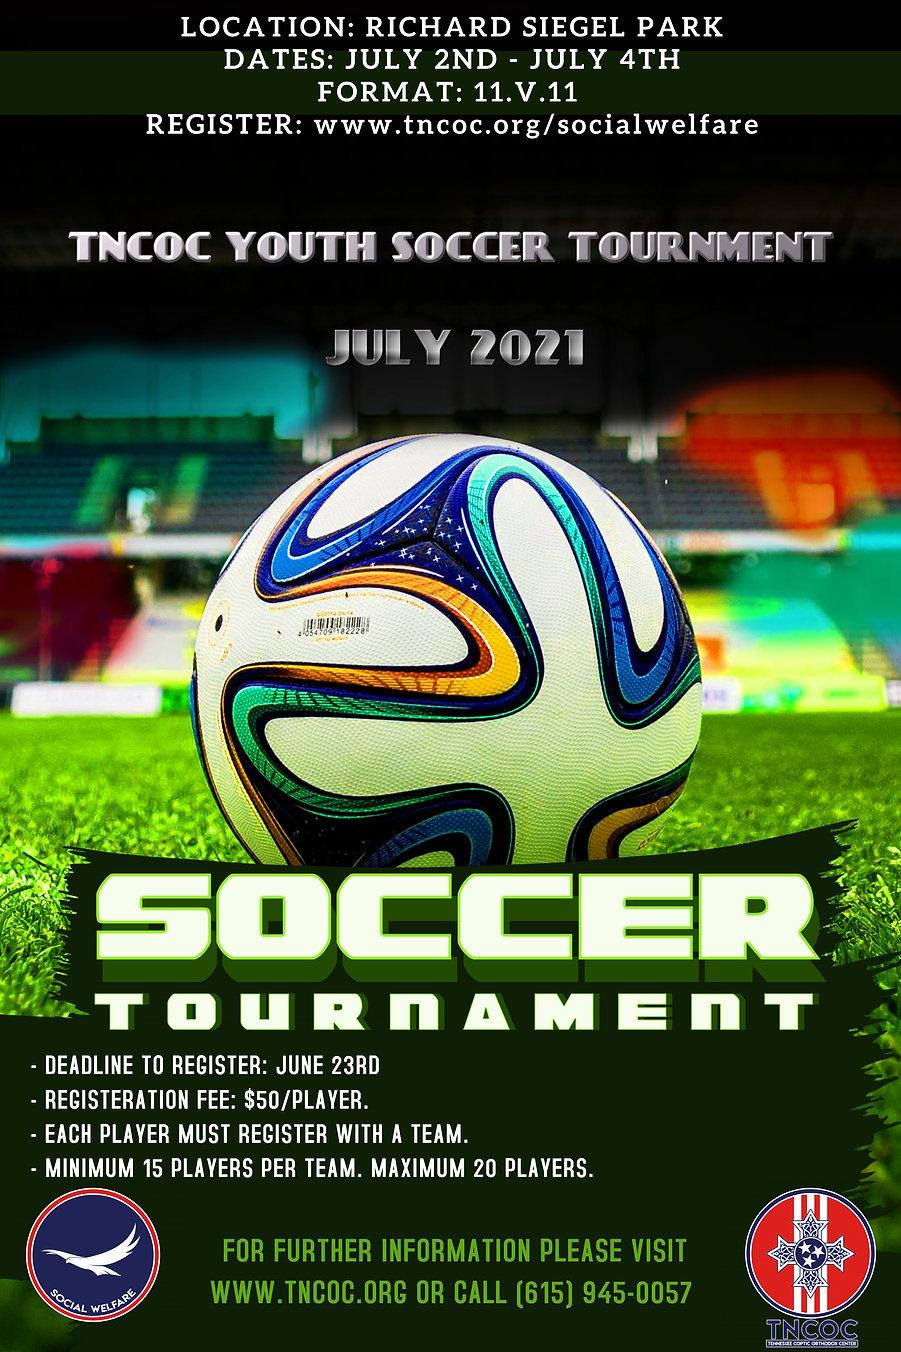 Copy of Soccer Tournament Poster Templat